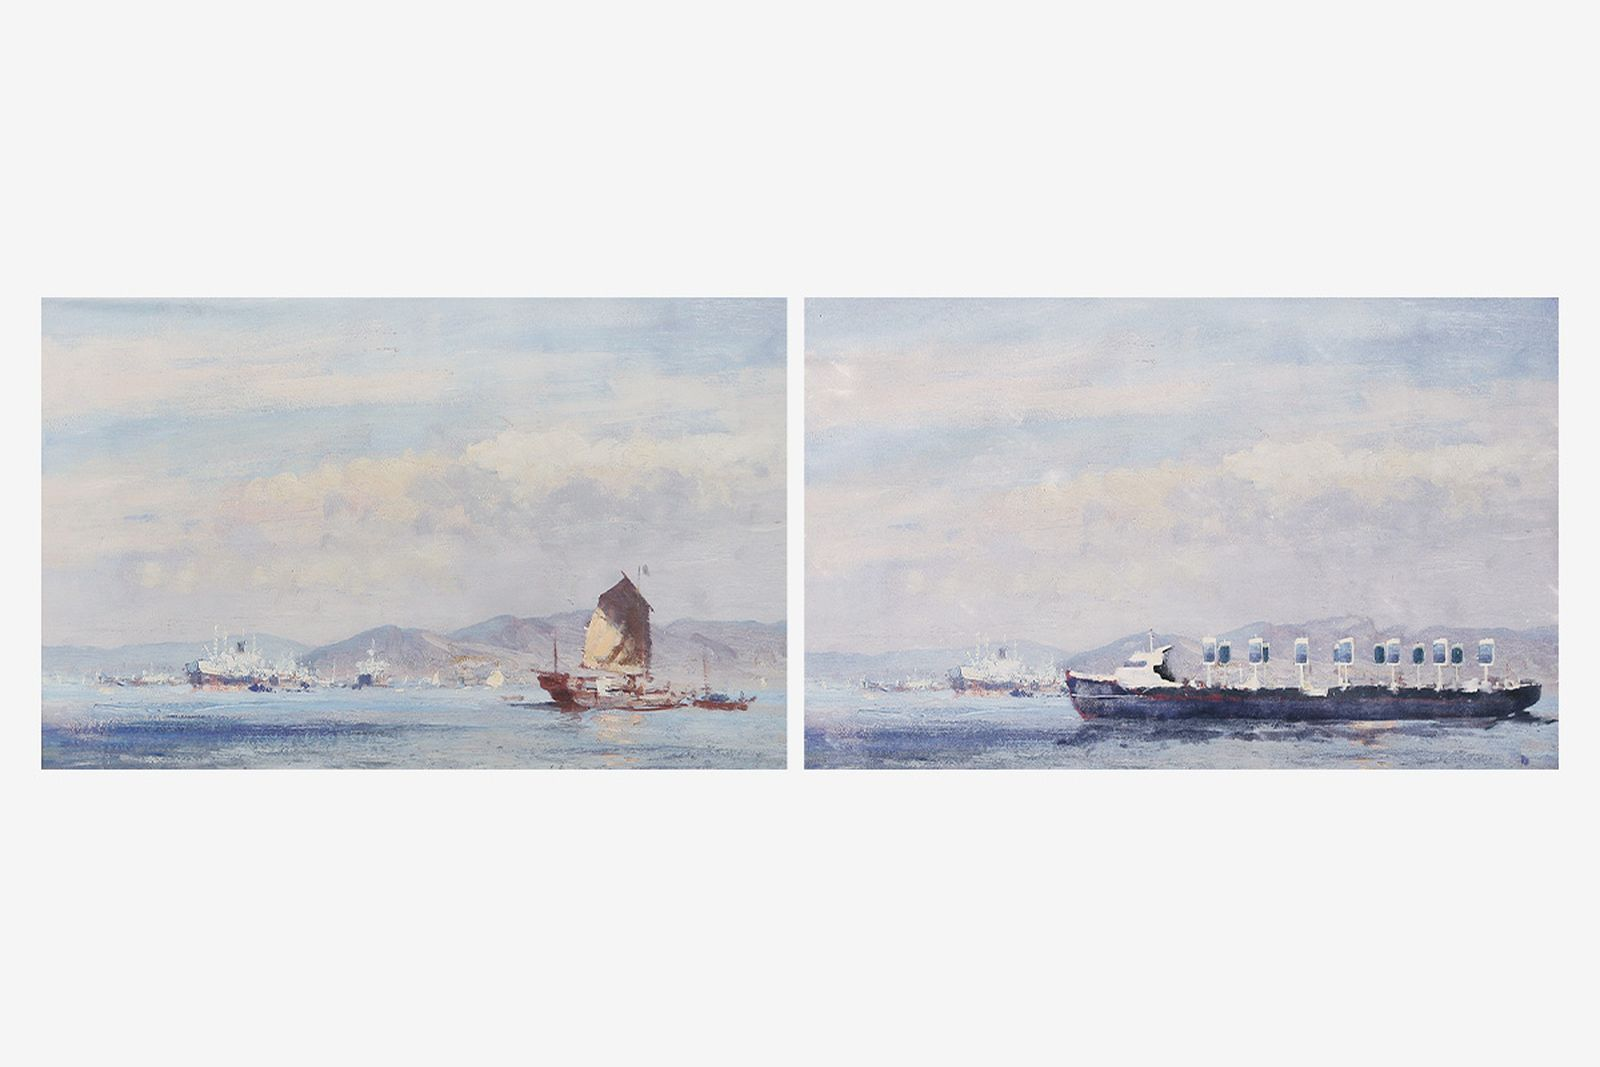 reuben-dangoor-taps-the-great-masters-to-imagine-future-seascapes-03